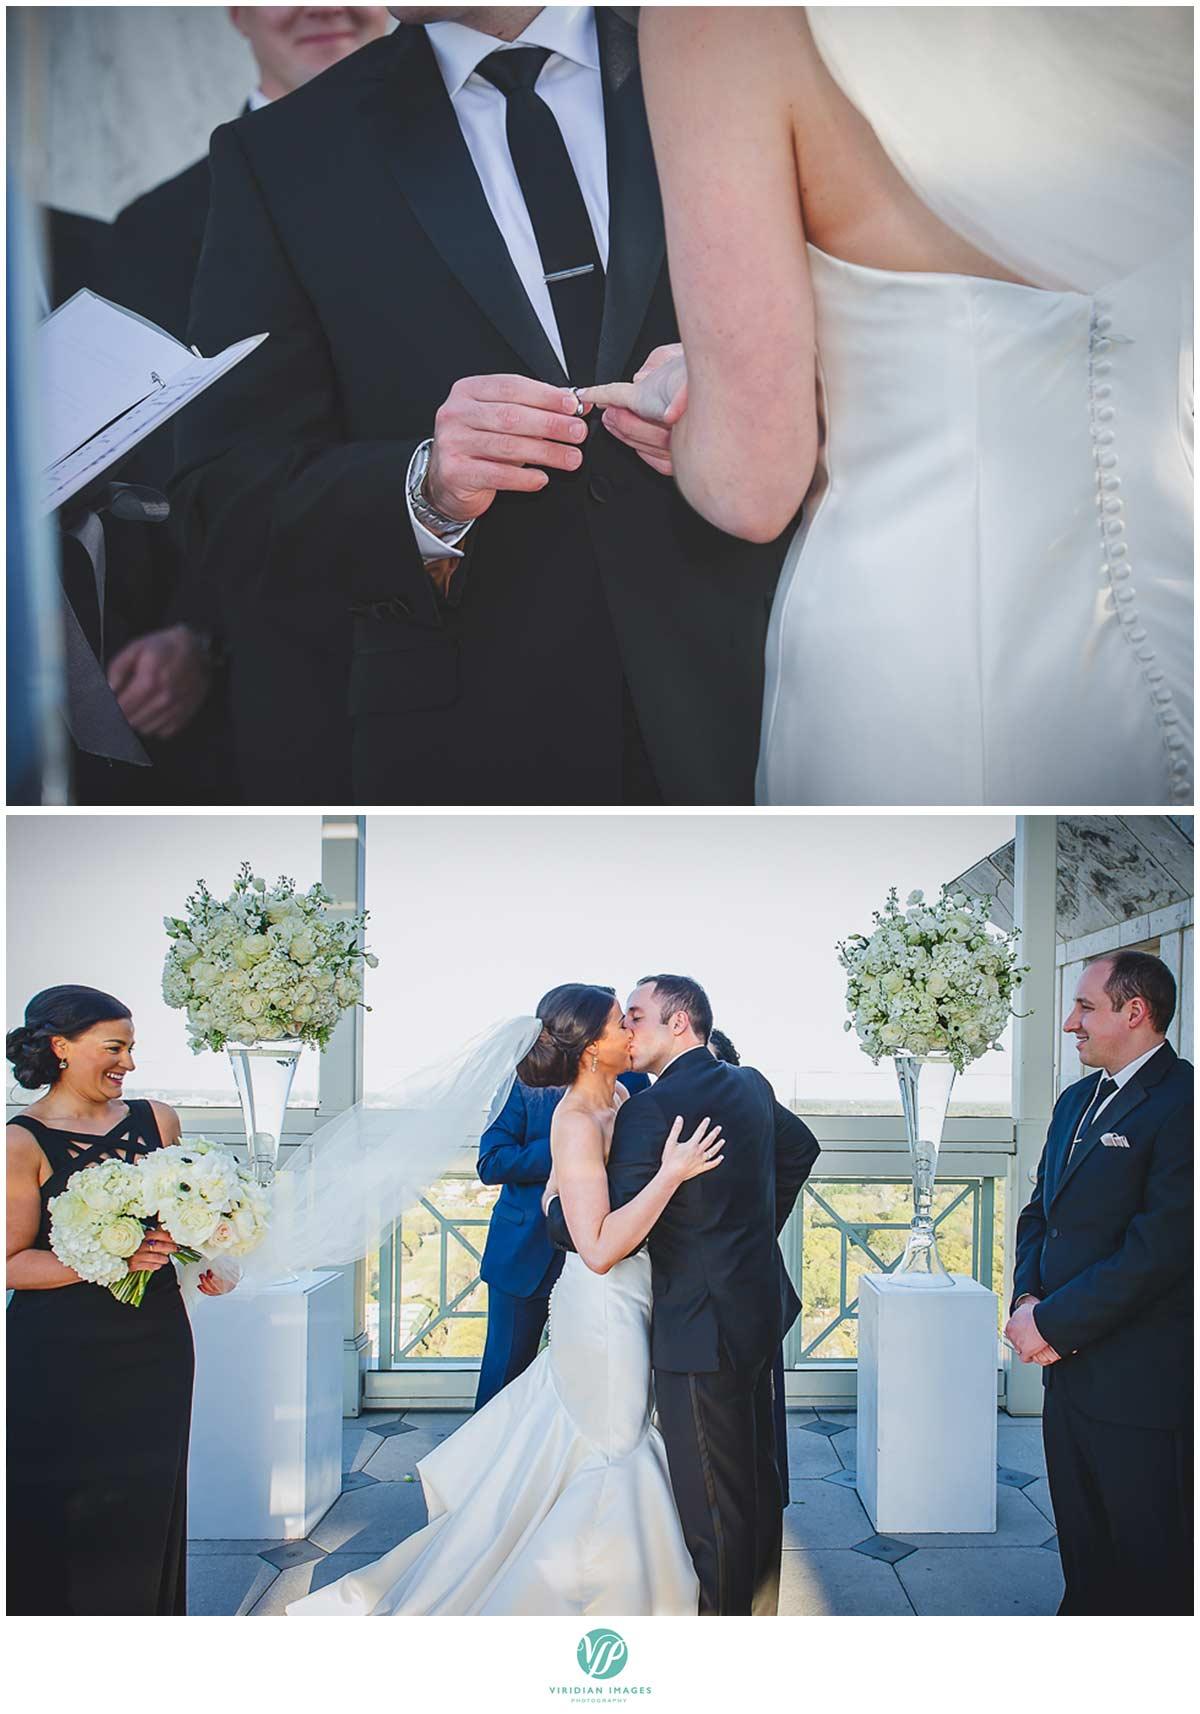 Peachtree_Club_Atlanta_Wedding_Viridian_Images_Photography-28